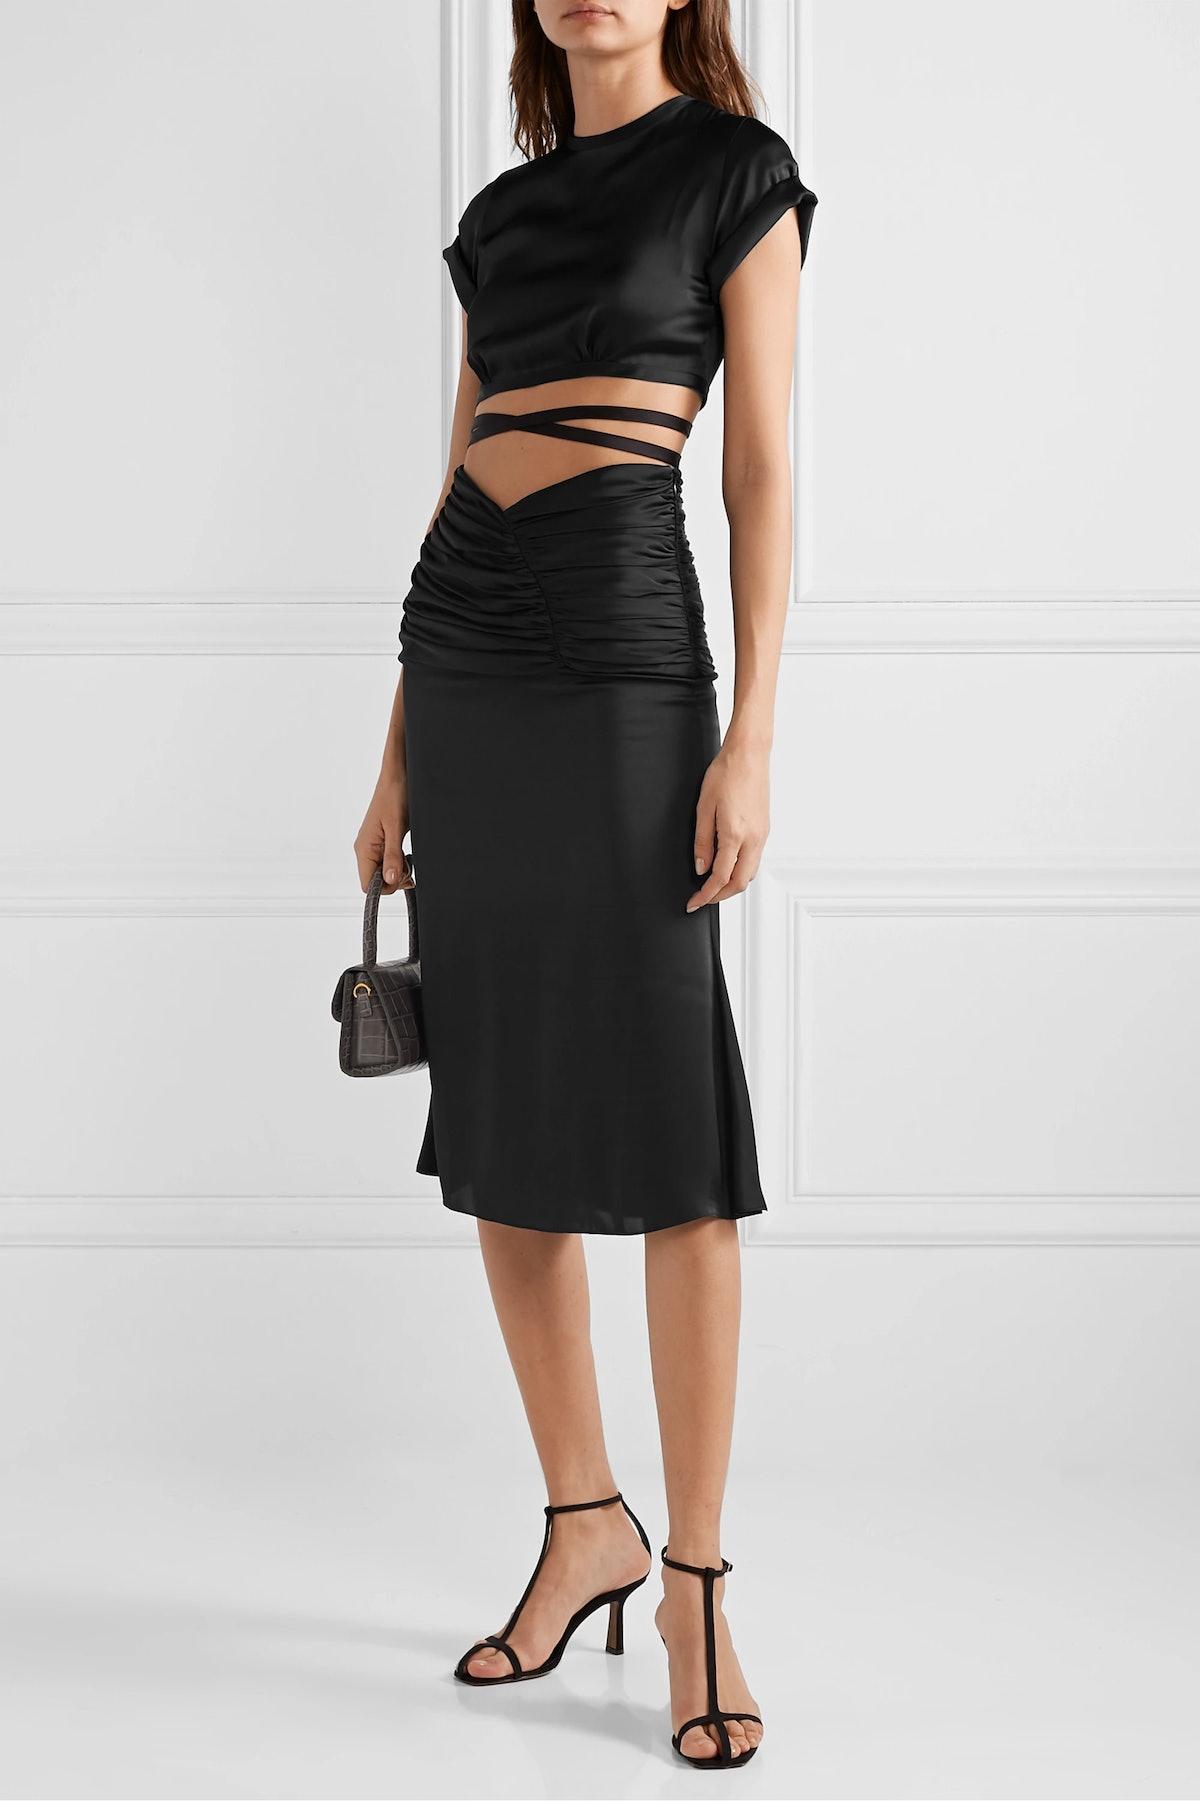 Romantique Ruched Satin Skirt